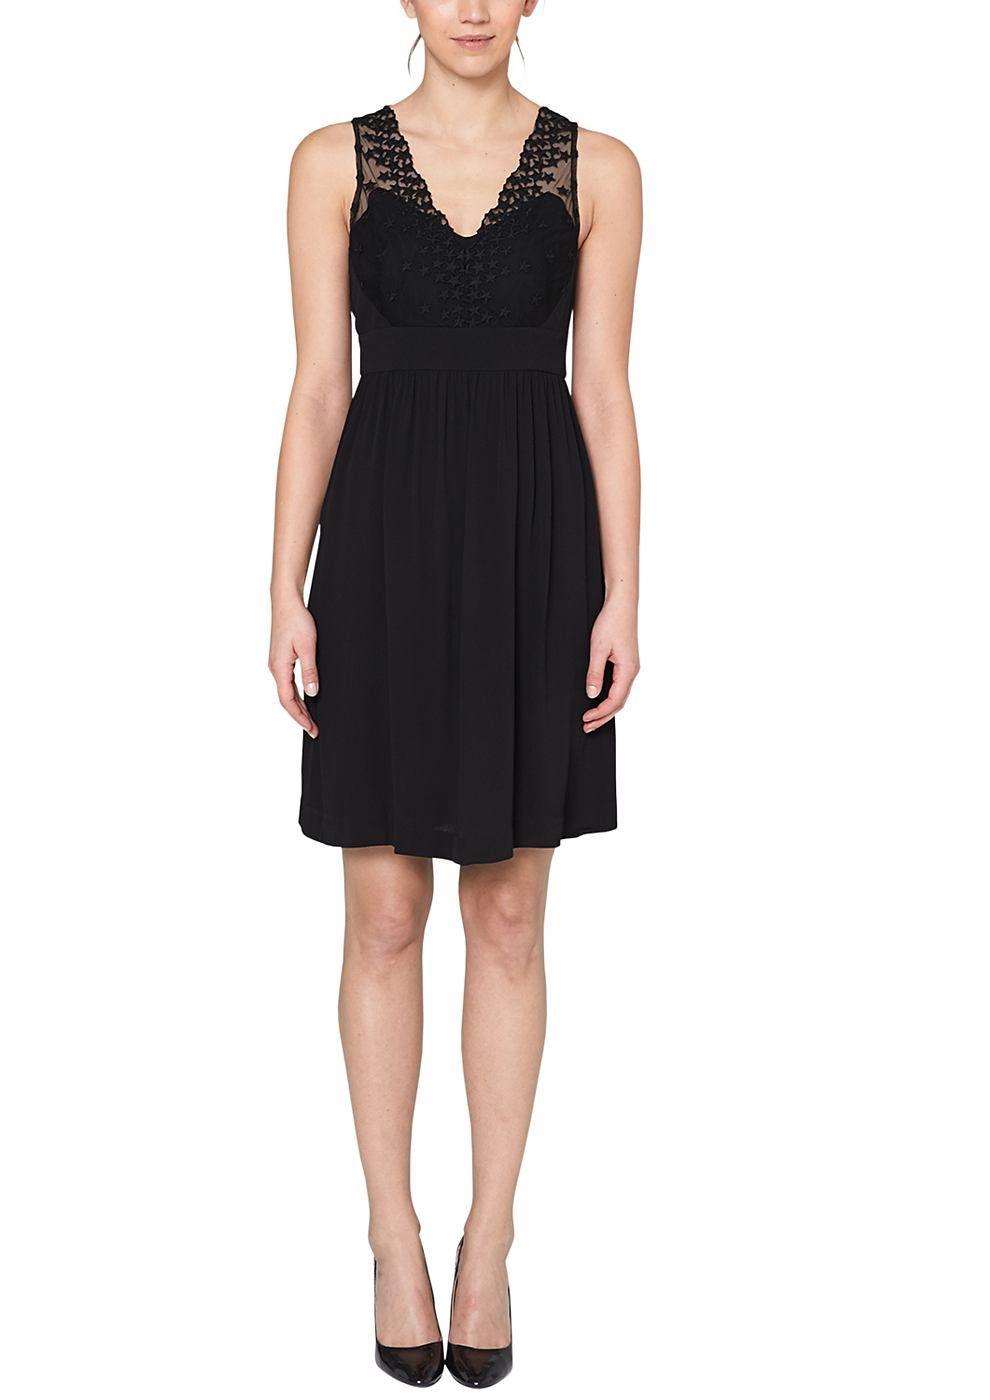 Kurzes Kleid Elegantes Trägerkleid. Oberteil aus semitransparenter ...